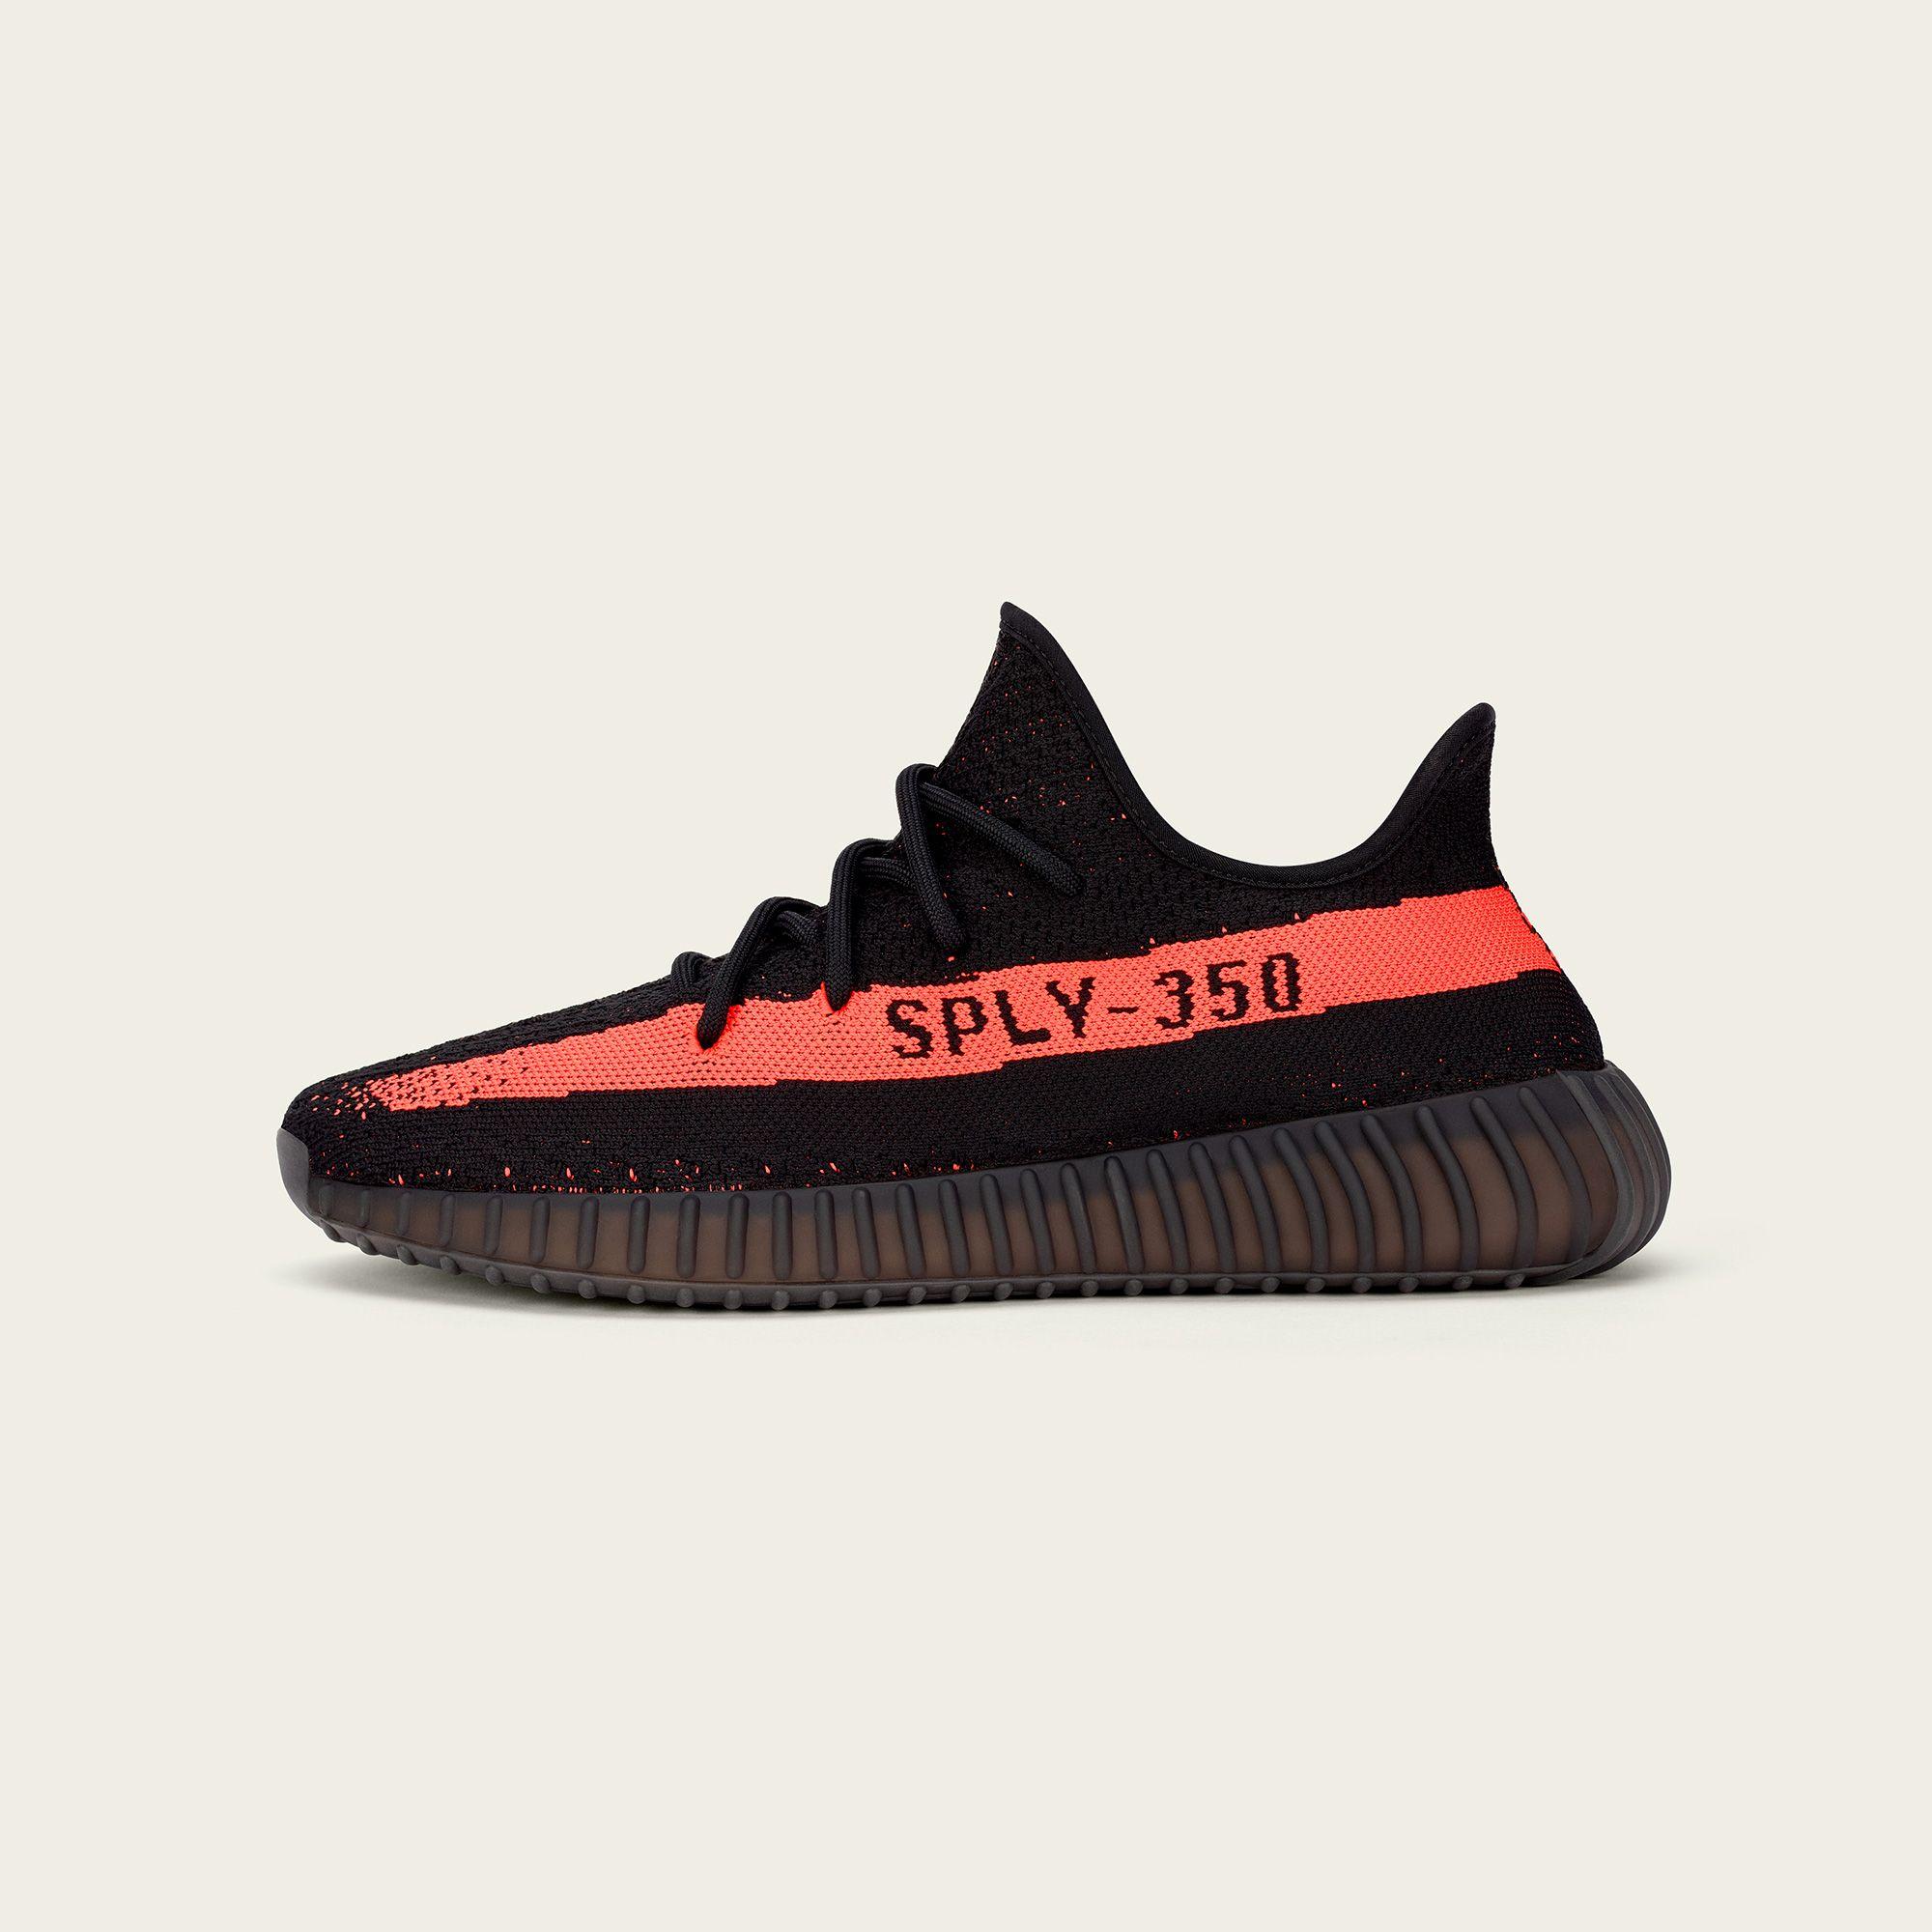 adidas nmd black men kanye west x adidas yeezy 350 boost low black